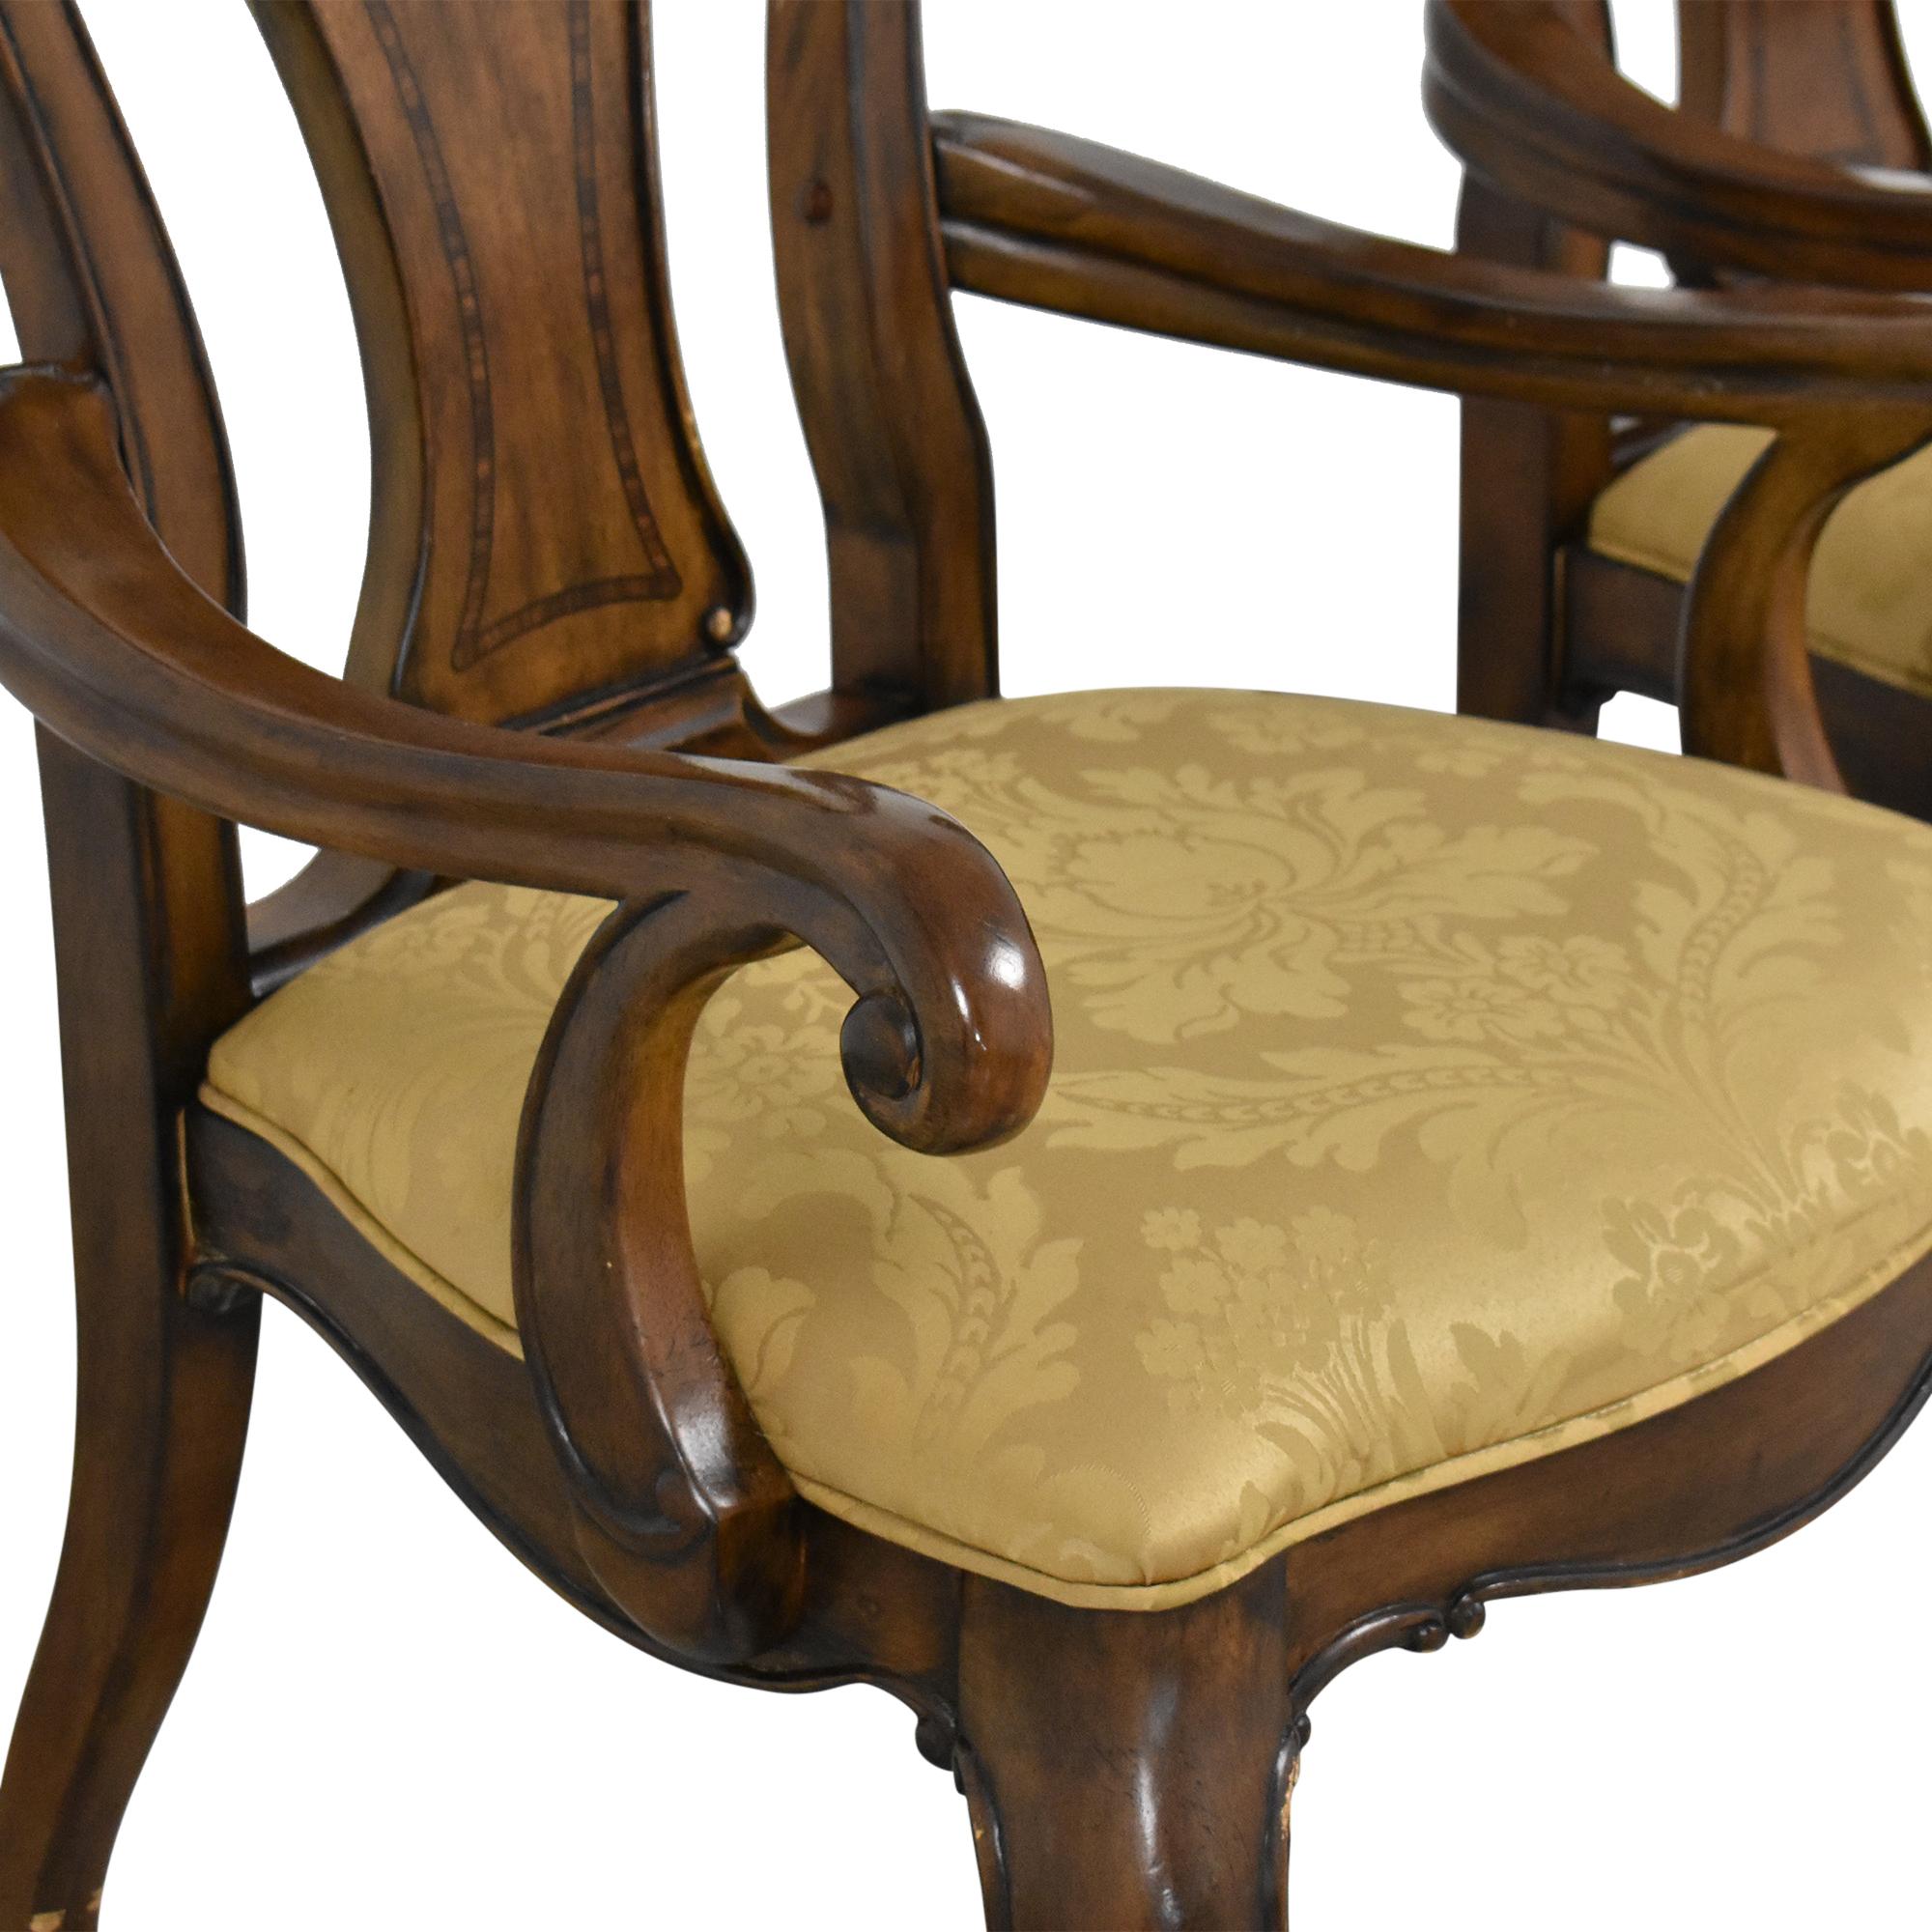 Thomasville Thomasville Ernest Hemingway Granada Dining Arm Chairs second hand